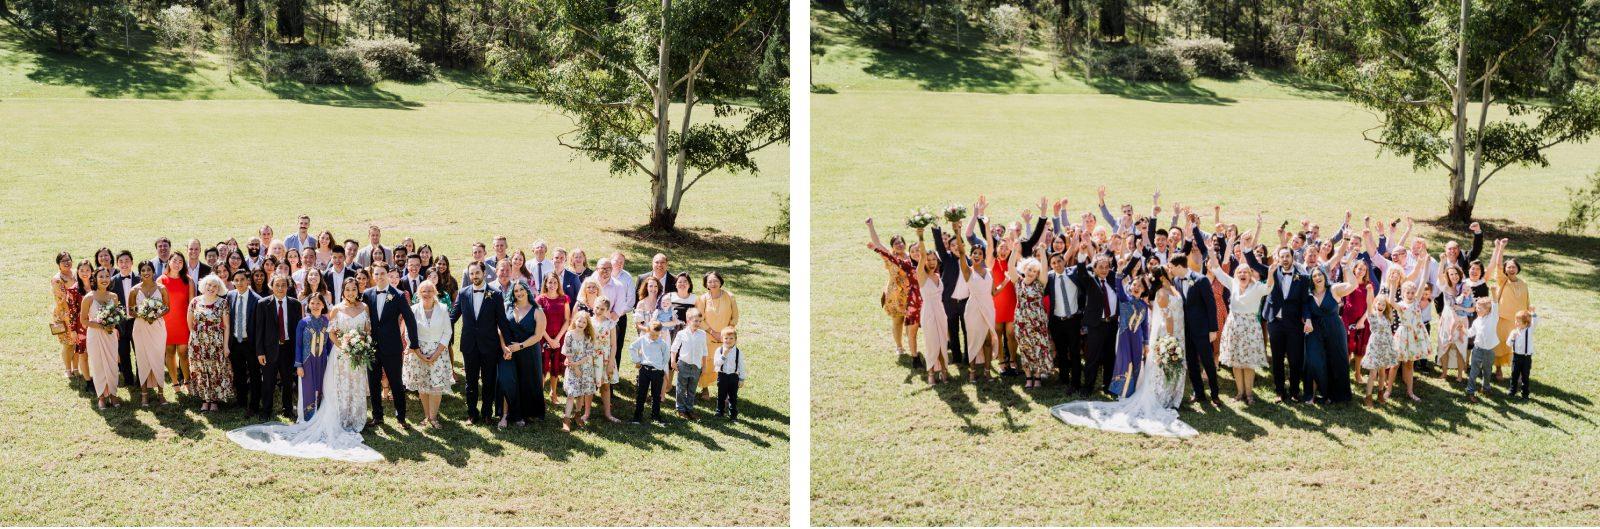 wollombi-wedding-photography-hunter-valley-wedding-photographers-44